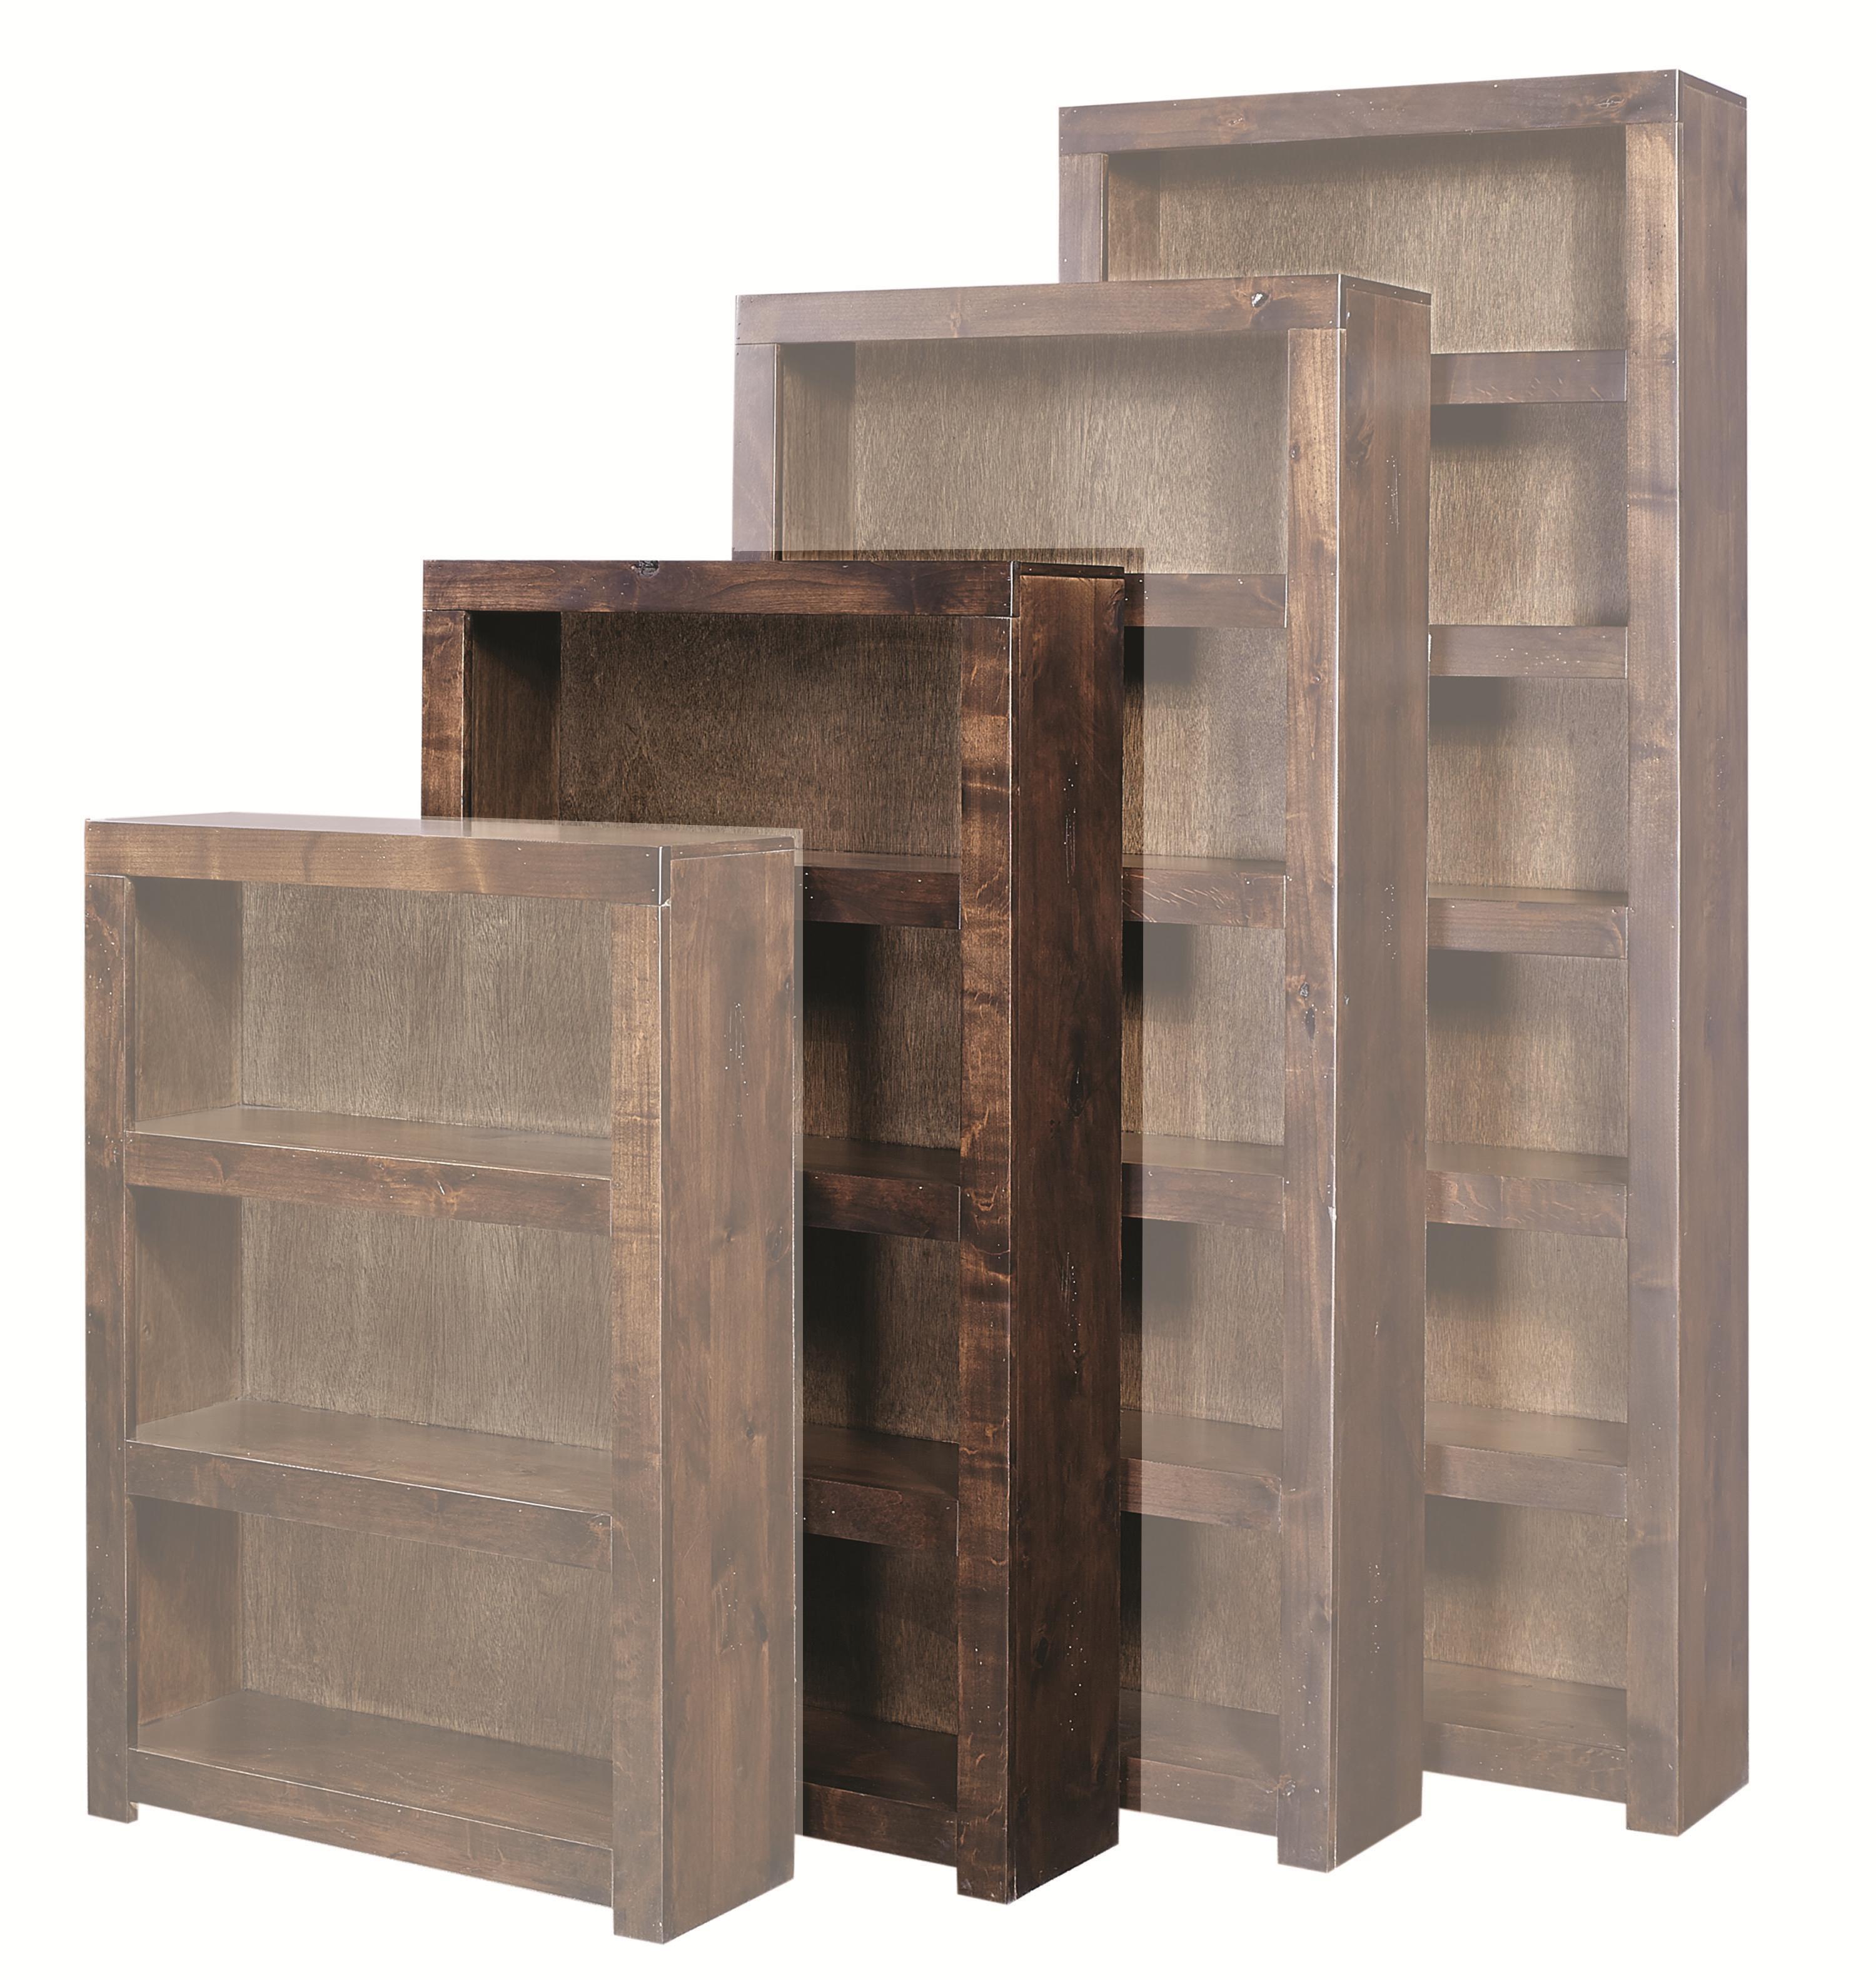 Contemporary Alder 60 Inch Bookcase by Aspenhome at Reid's Furniture